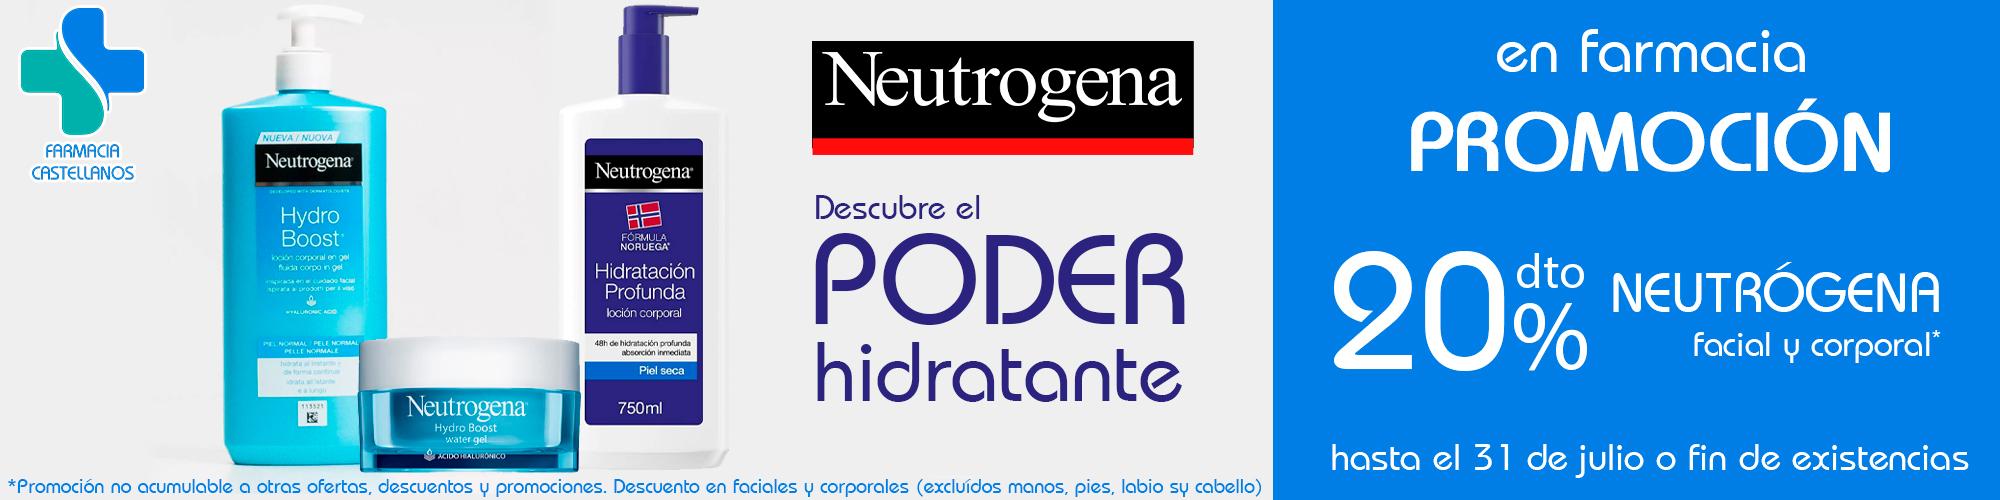 promocion-neutrogena-farmaciabeatrizcastellanos